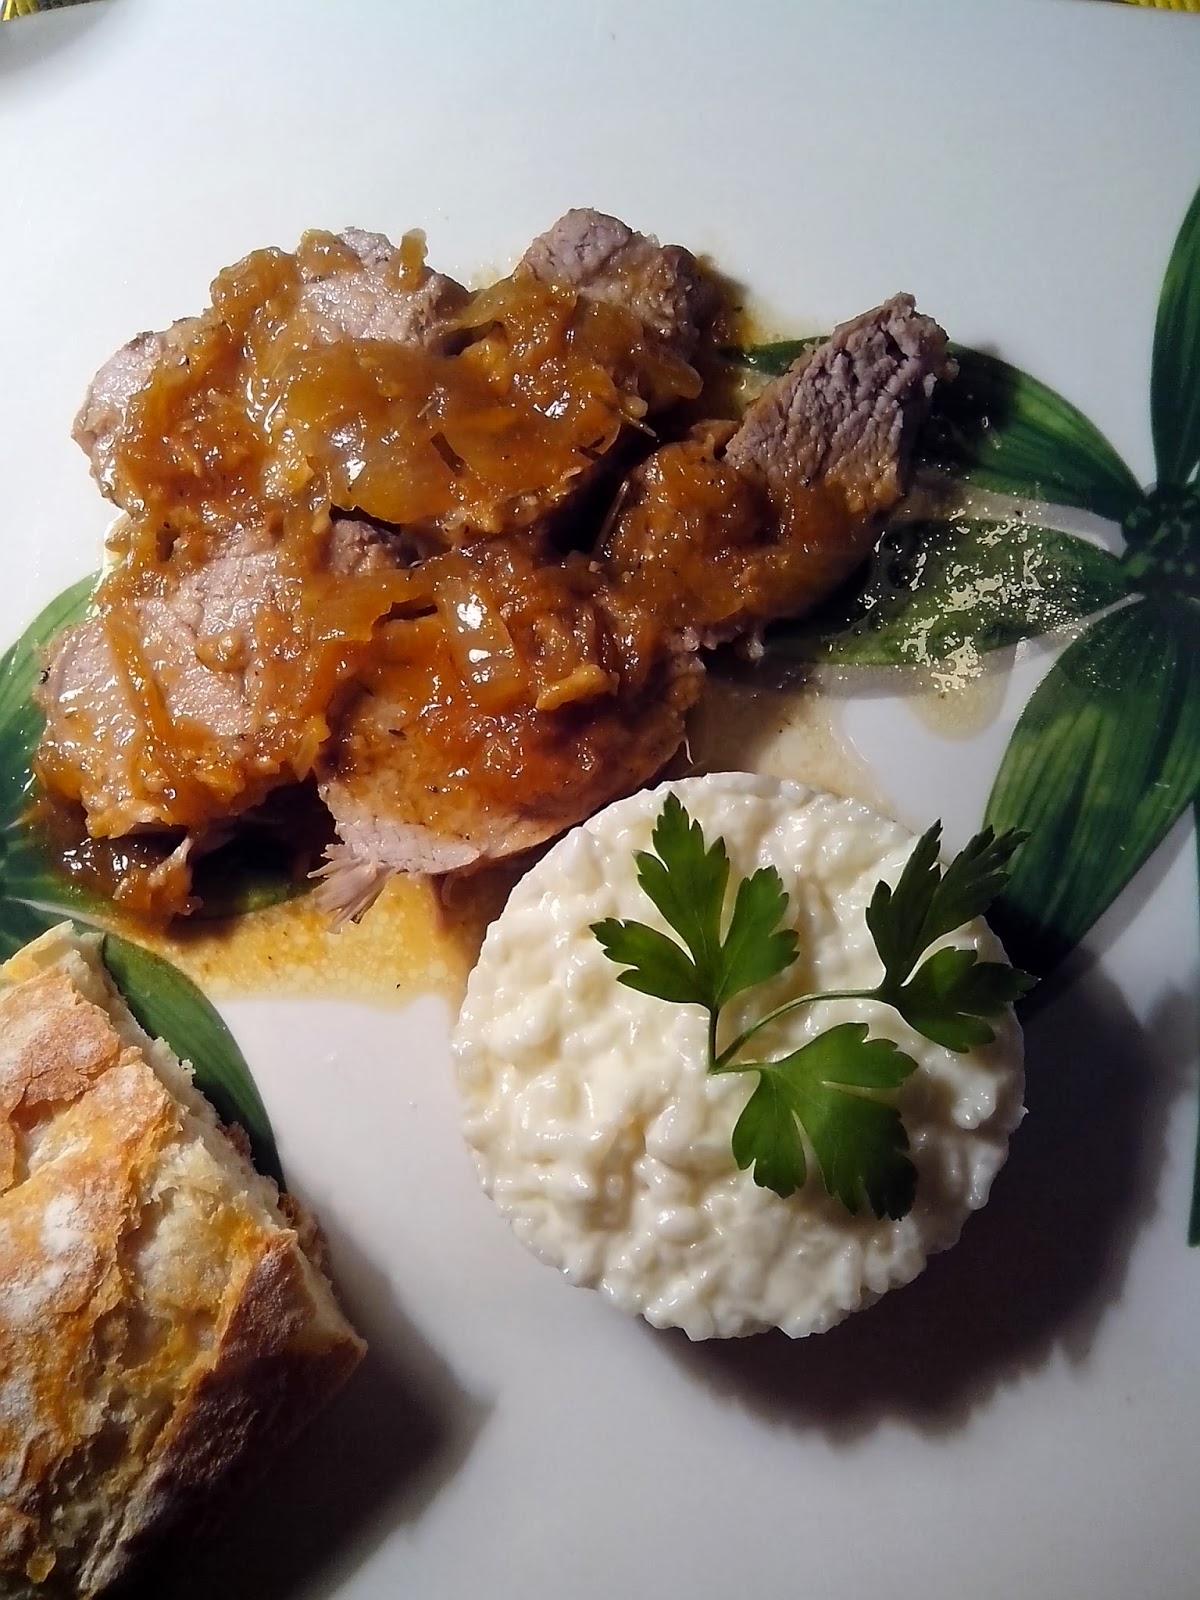 solomillo de cerdo al romero con risotto en blanco